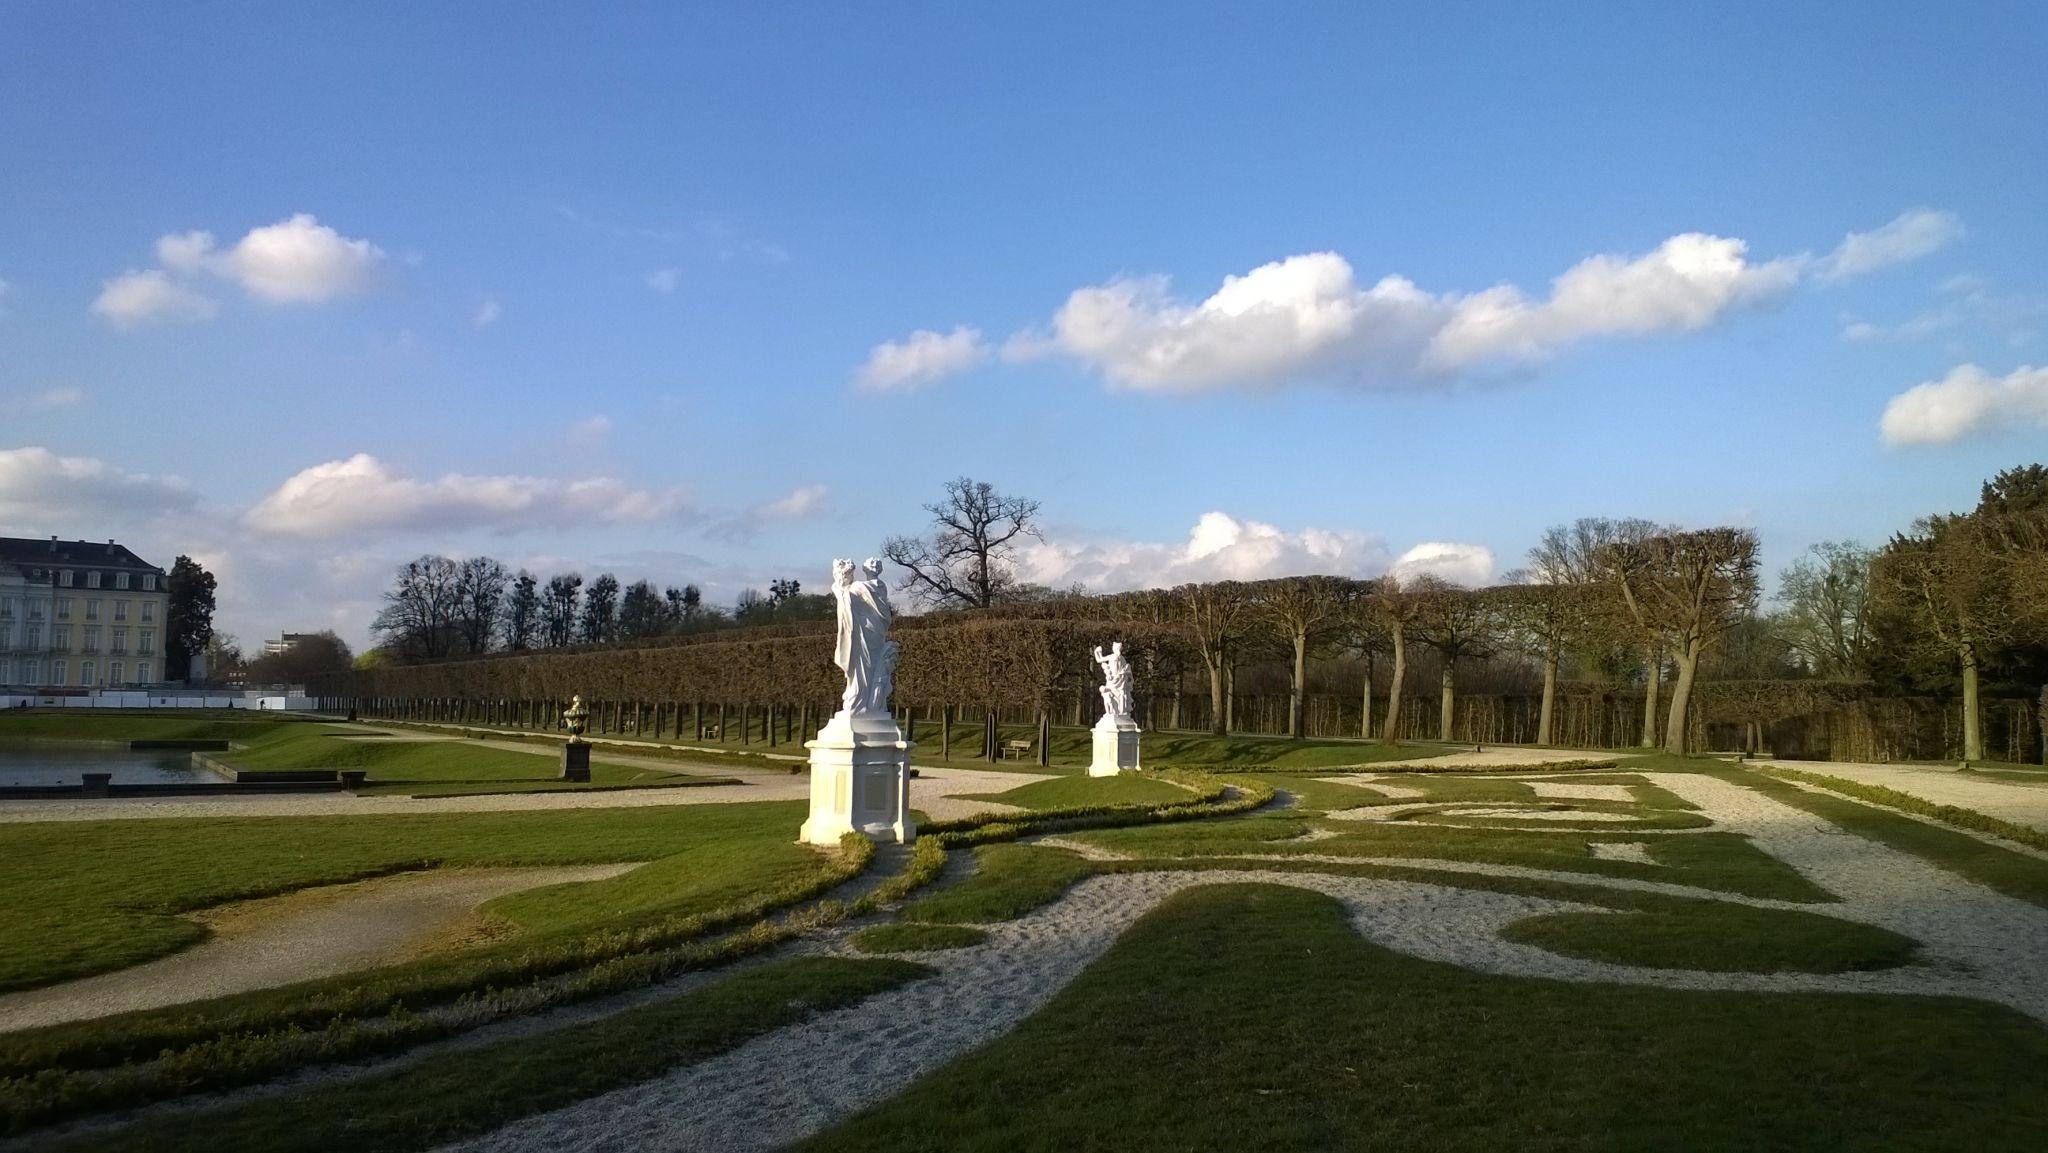 Schlosspark Schloss Augustusburg, Germany